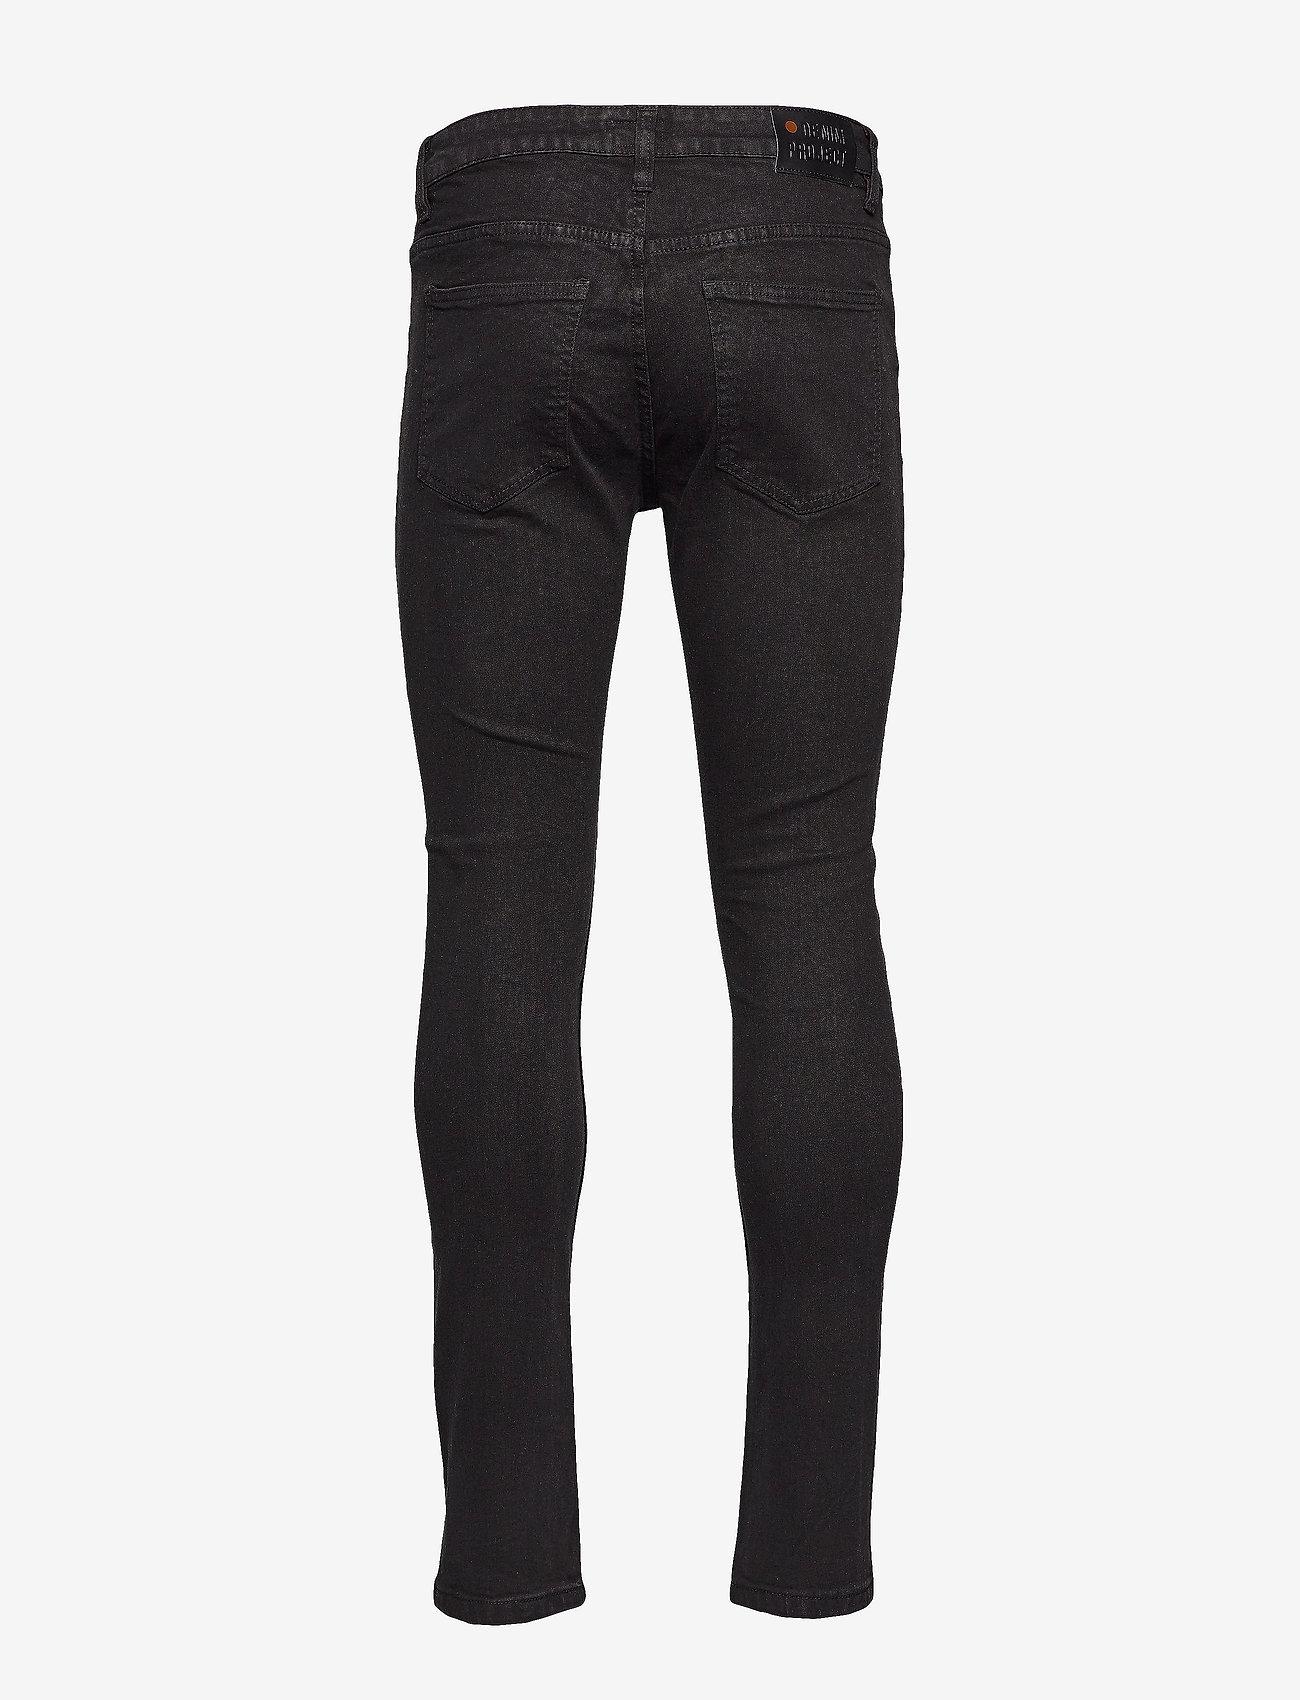 Denim project - Mr. Red - skinny jeans - black - 1